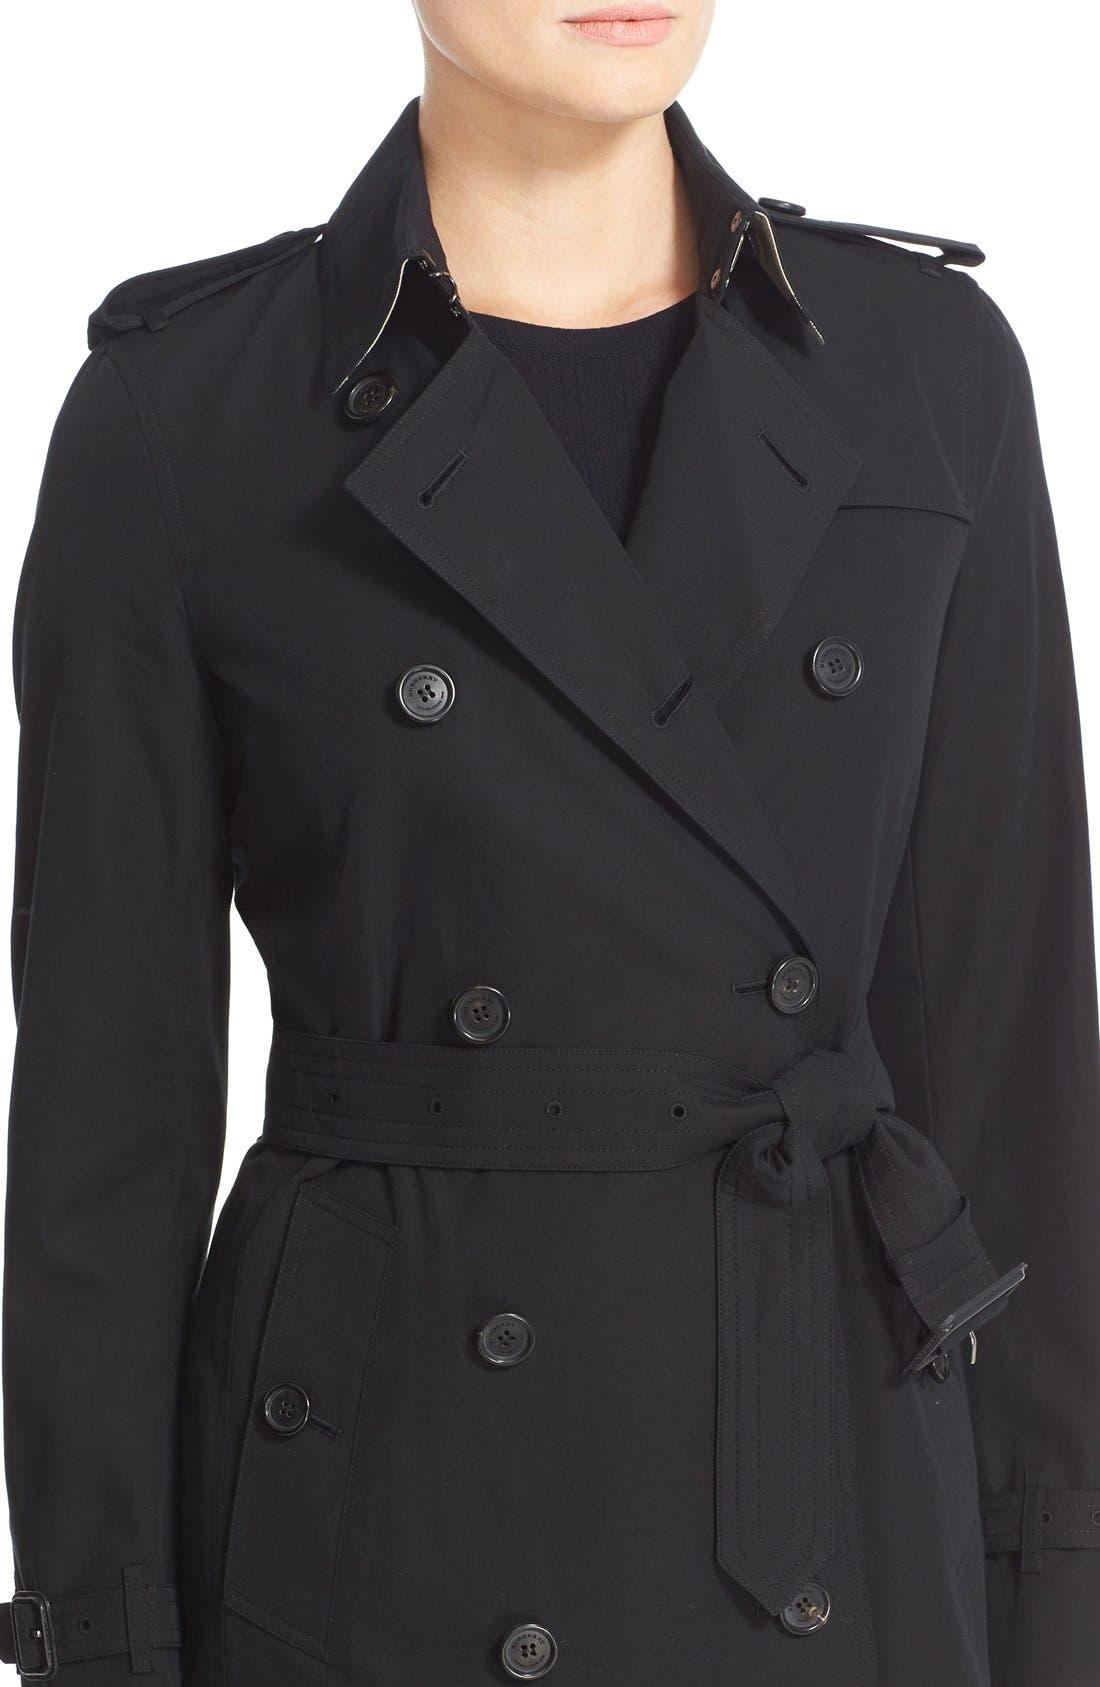 Kensington Mid Trench Coat,                             Alternate thumbnail 6, color,                             BLACK